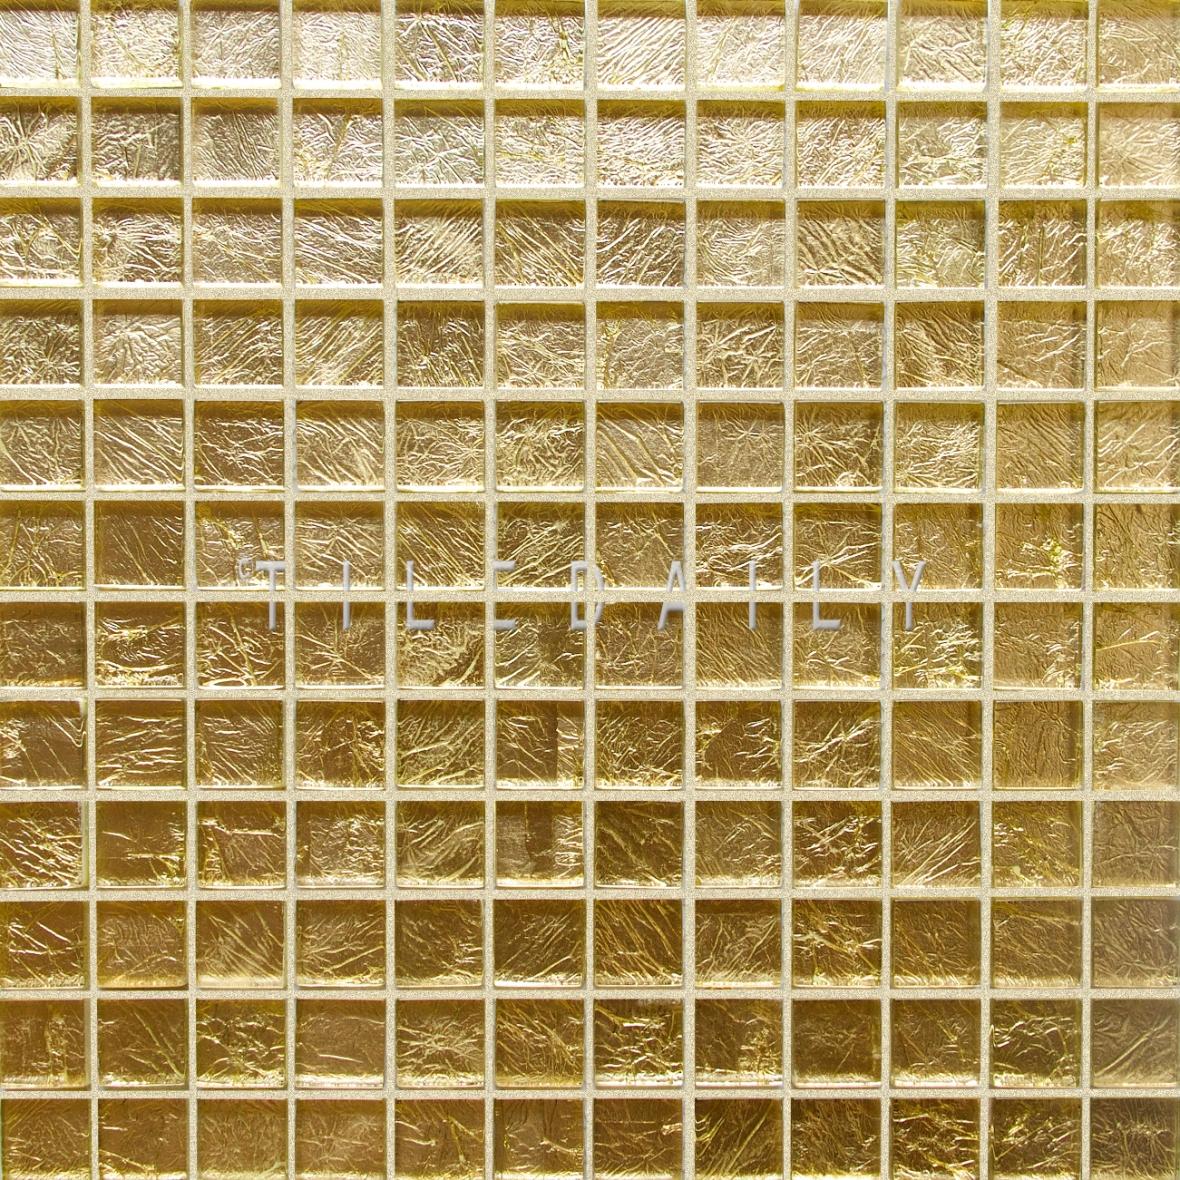 GM0068 - 1x1 Gold Glass Mosaic Tile